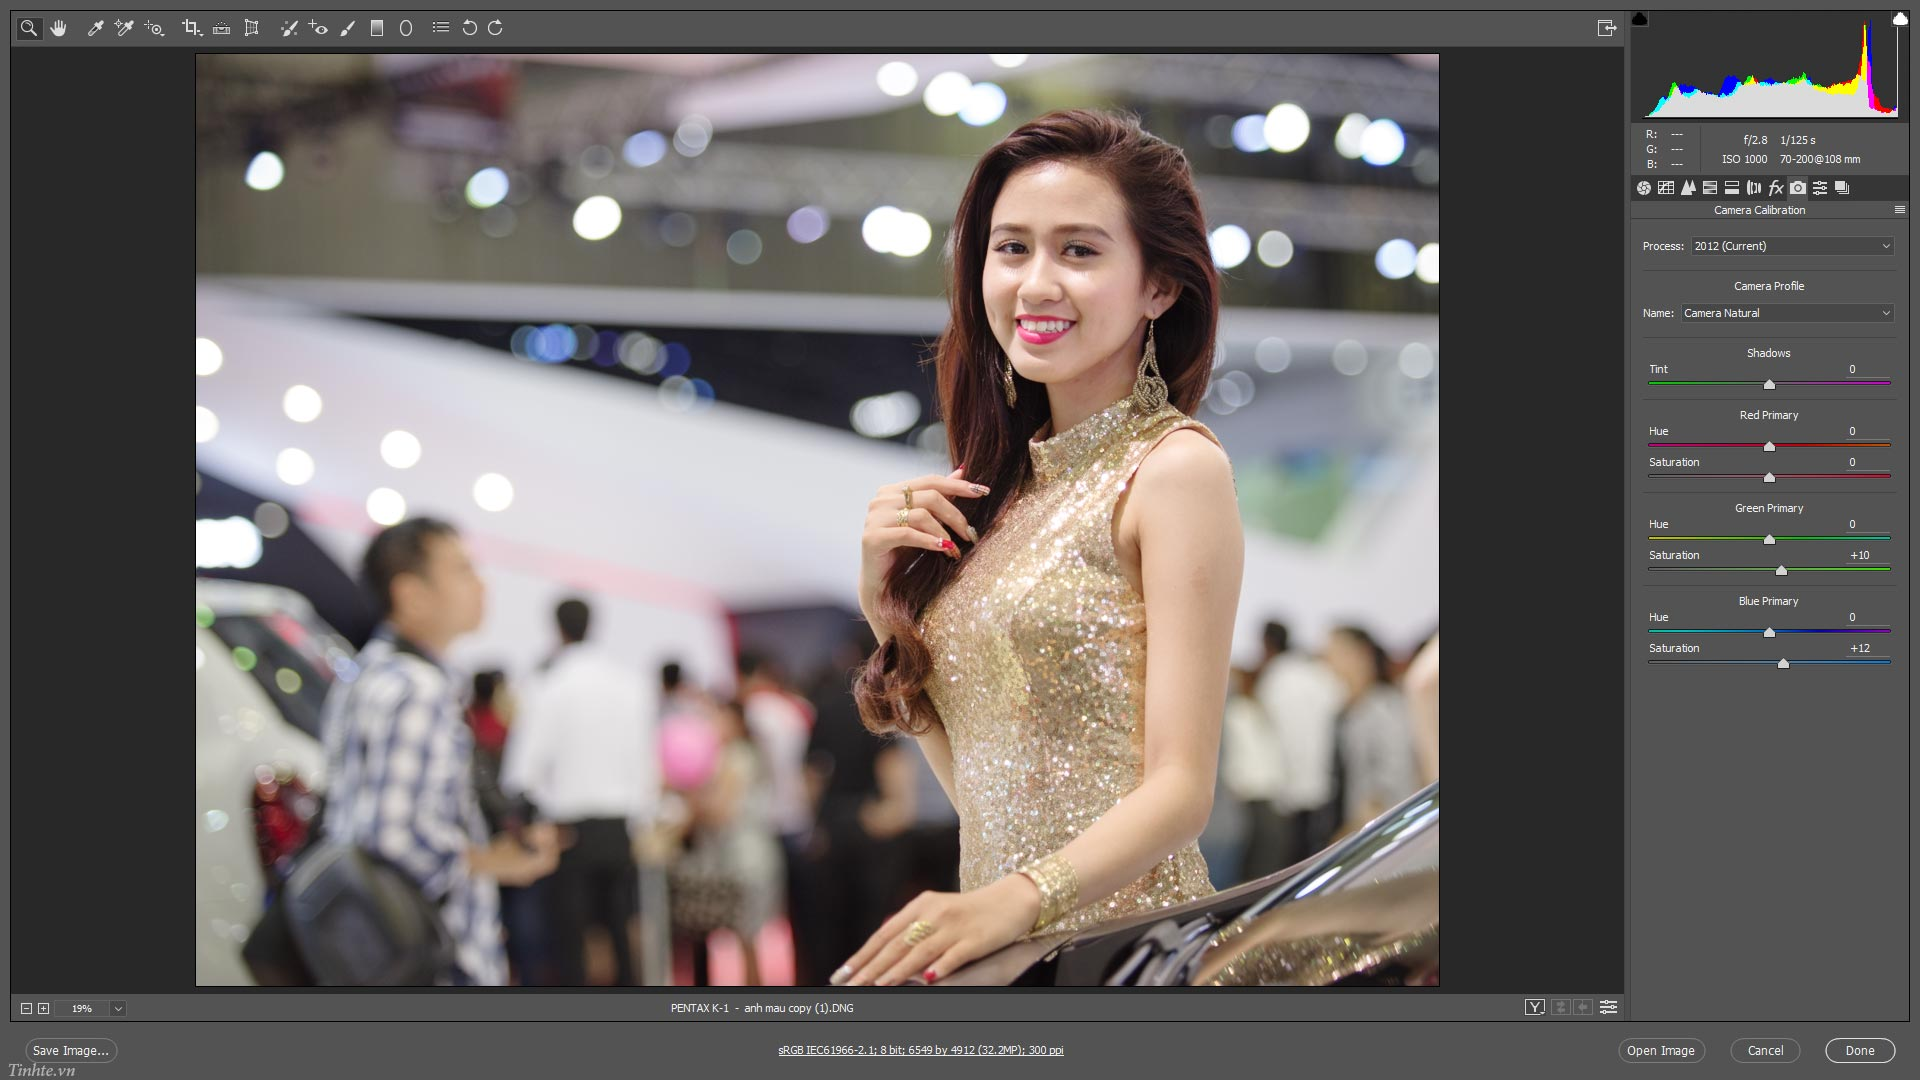 Lam_anh_sang_ro_trong_treo_hon_tinhte.vn_05.jpg